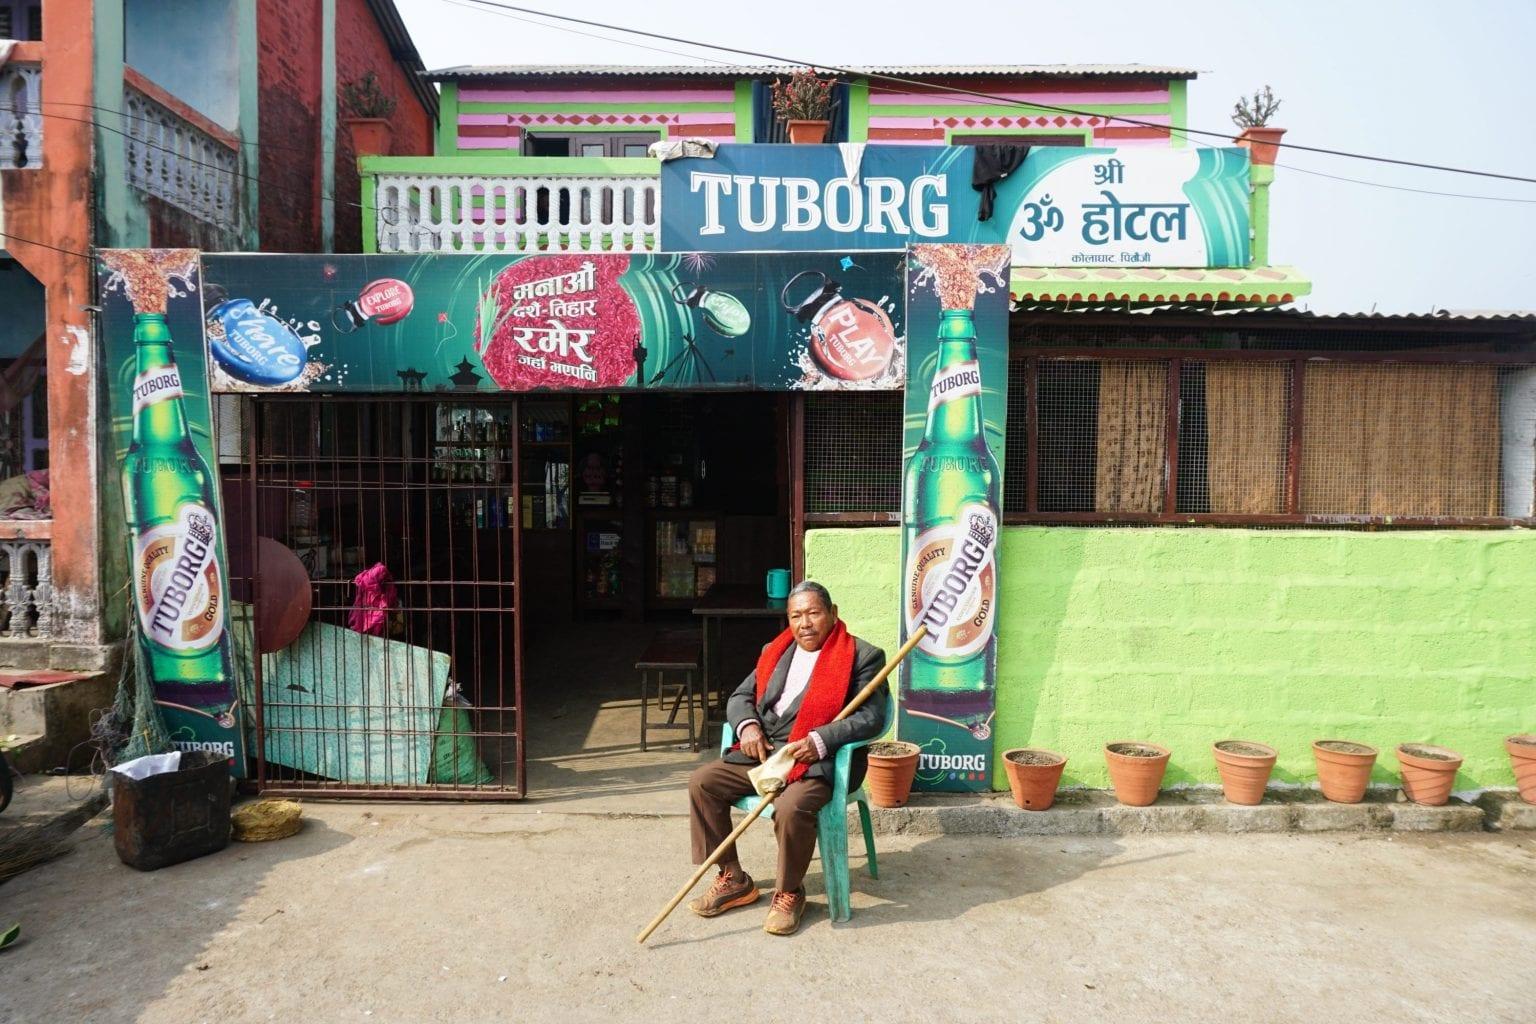 Carlsberg dominerer ølmarkedet i Nepal. Det gør de også i Pitaunji, landsbyen der huser Carlsbergs bryggeri.